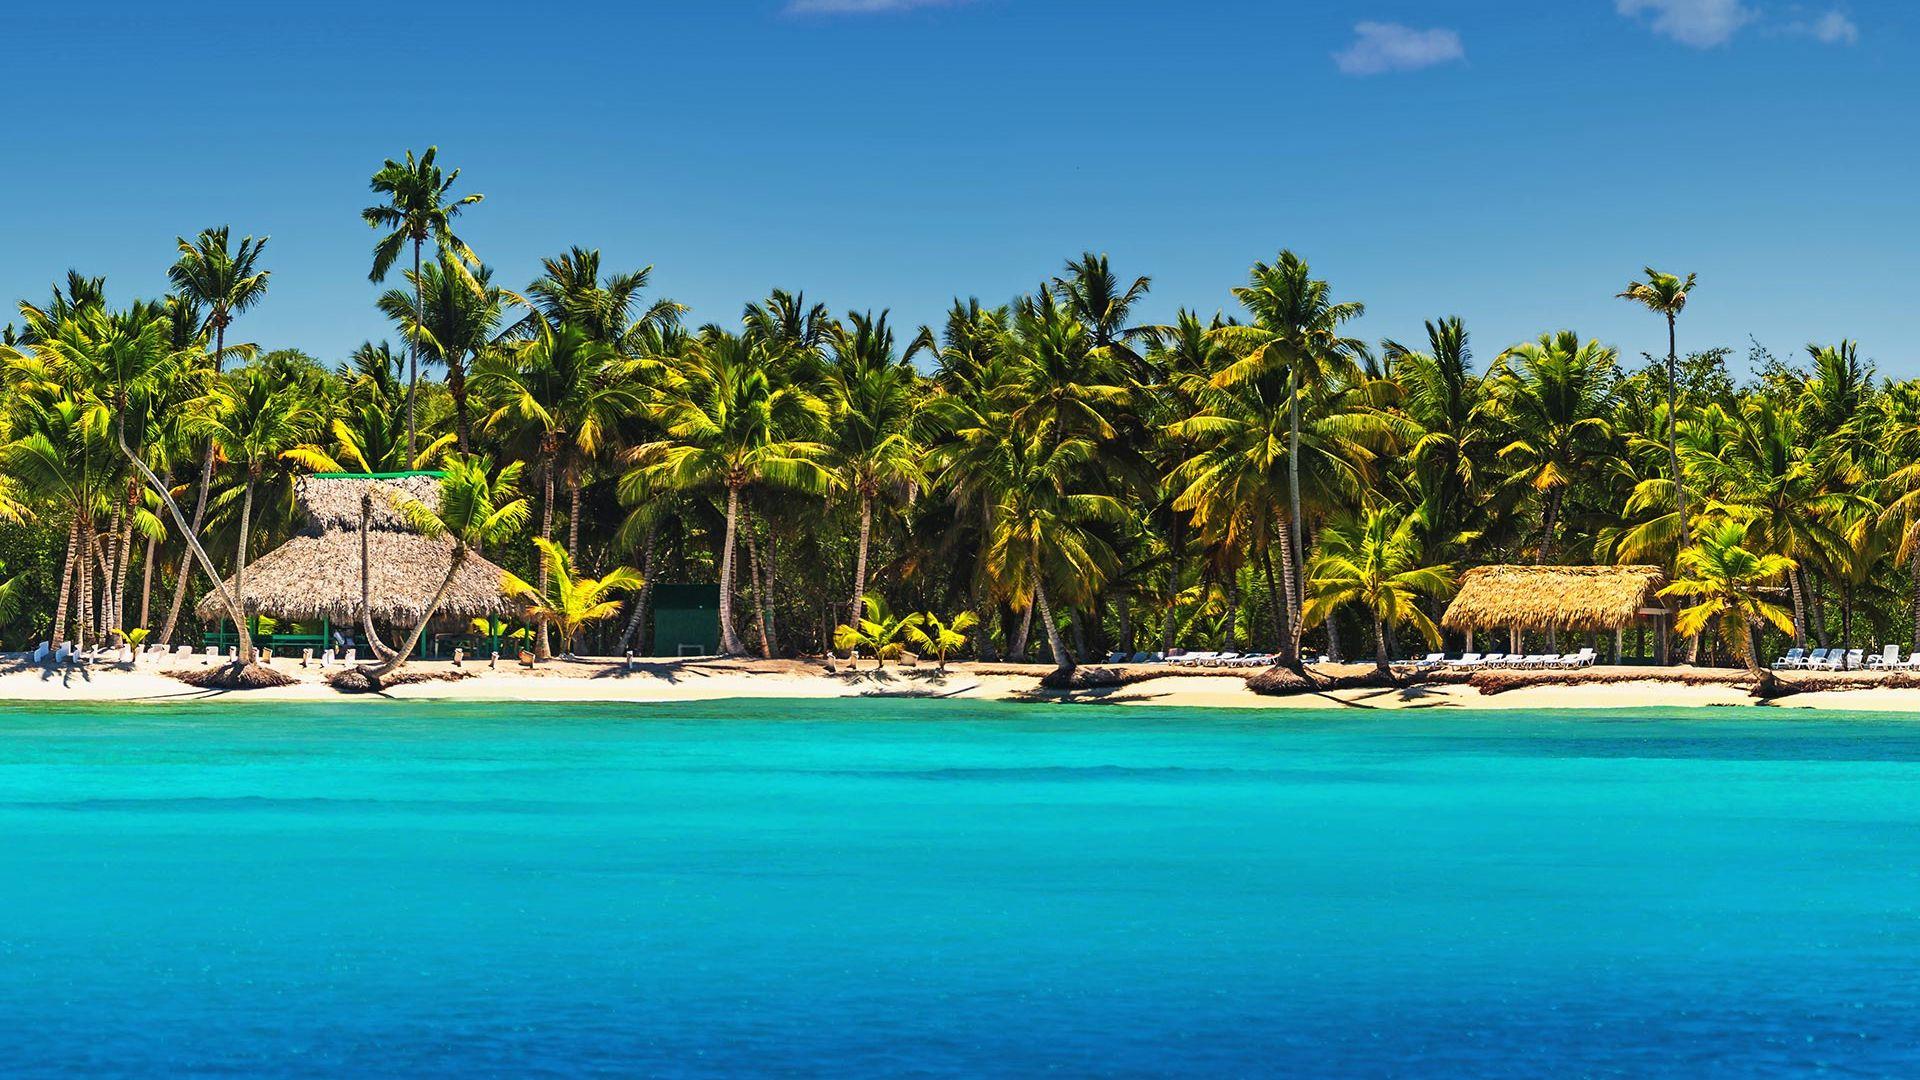 Sejur Plaja Punta Cana, Republica Dominicana, 11 zile - 4 ianuarie 2022